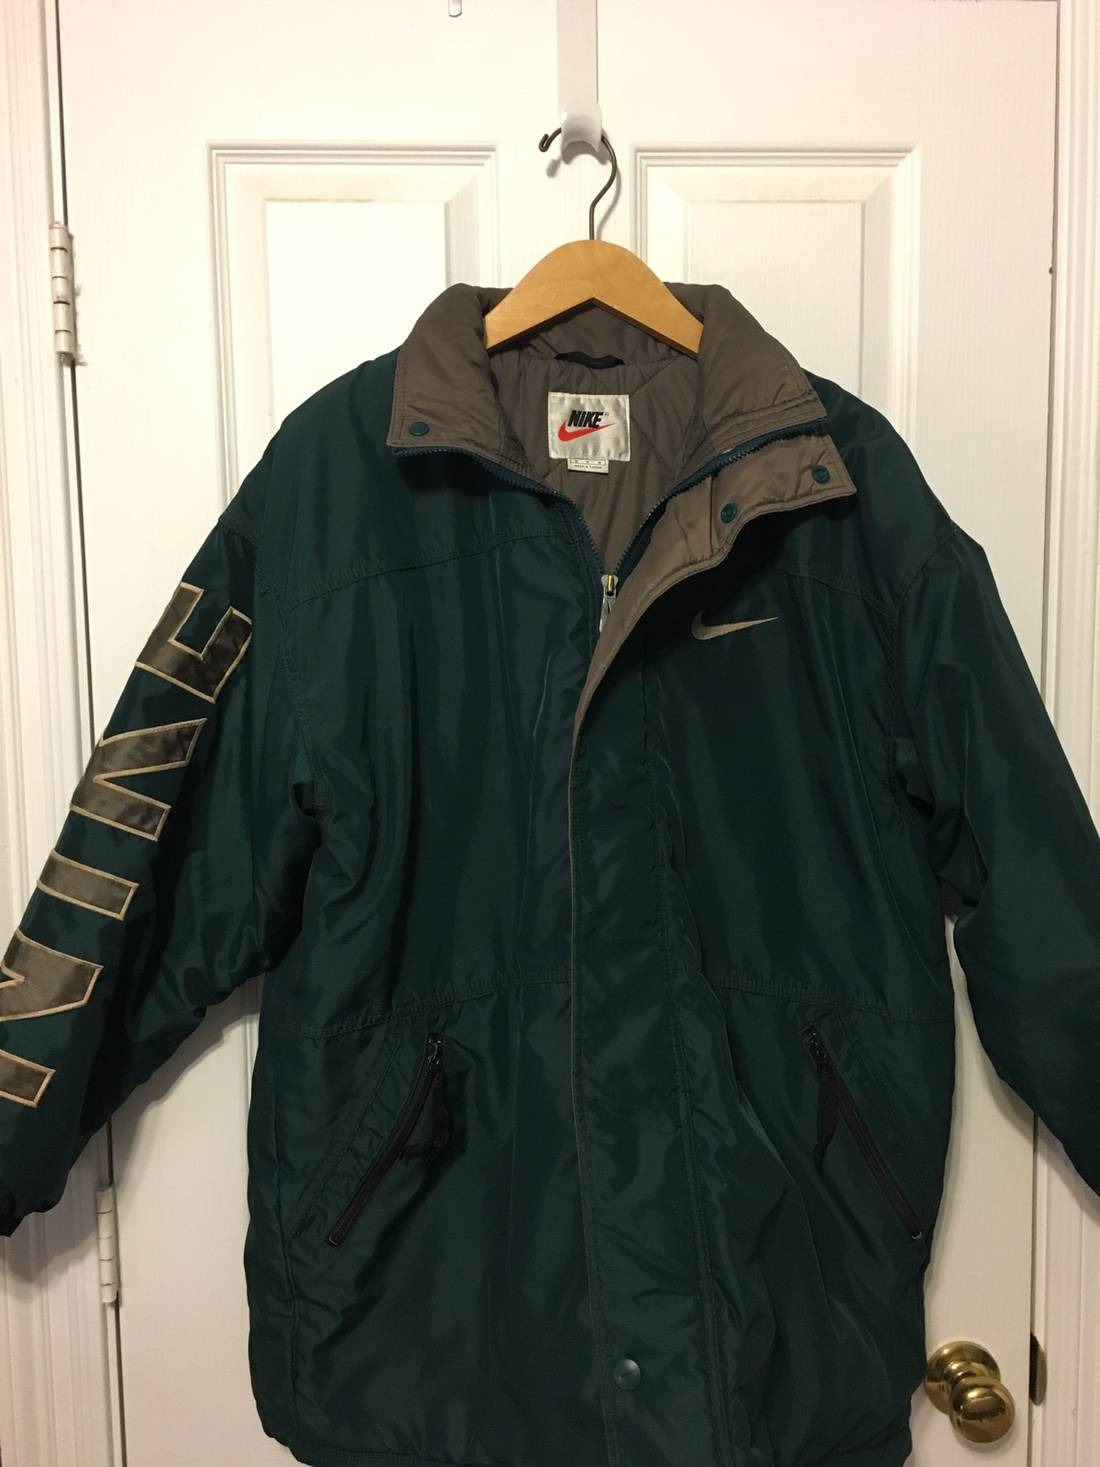 Vintage 90's NIKE SWOOSH Big Logo Nike Embroidered Spell Out Basketball Parka Jacket Hoodie Size Large K7eMb